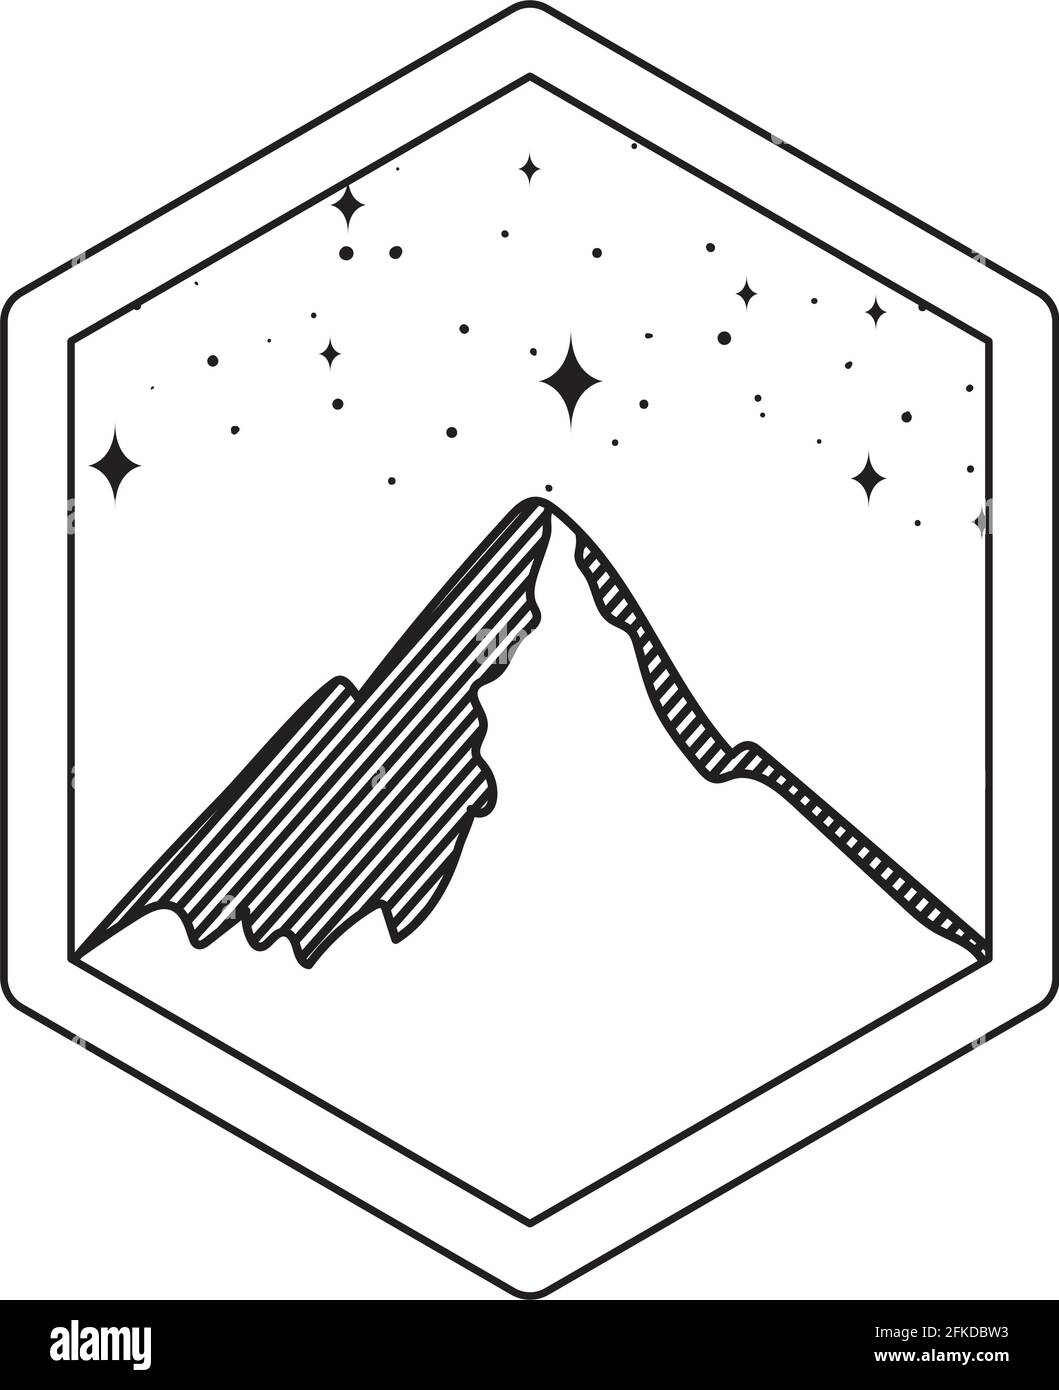 escudo de silueta de montaña Ilustración del Vector